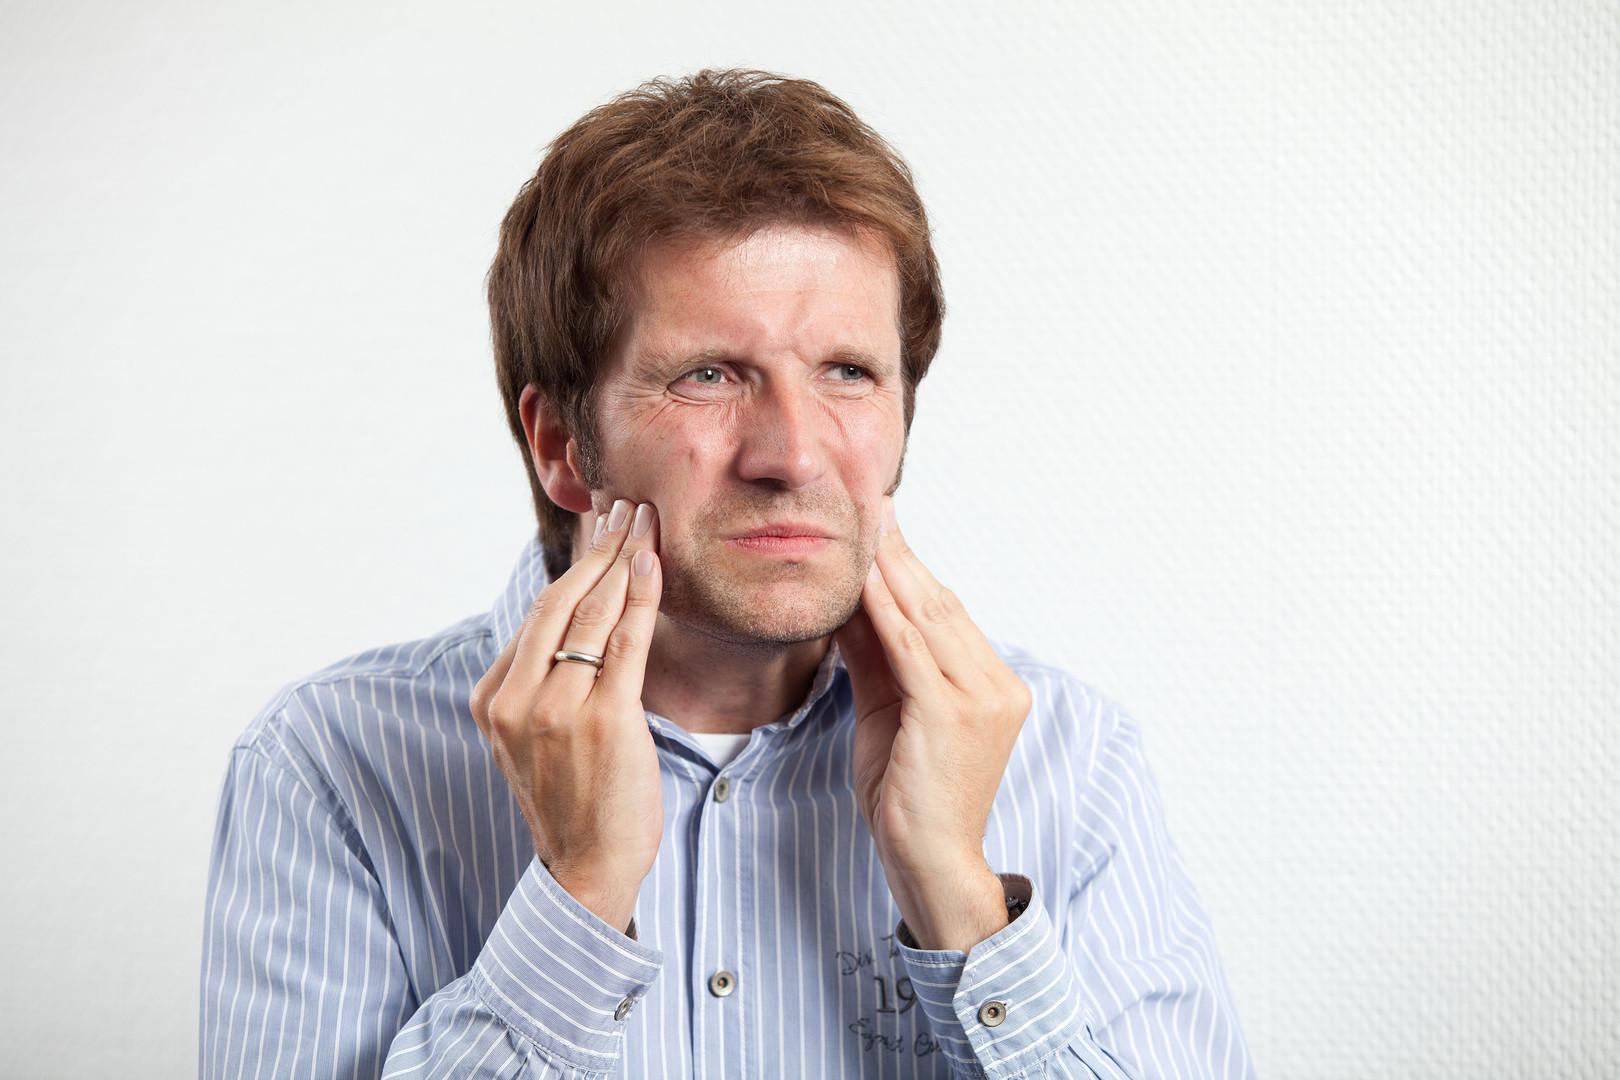 Zahnschmerzen Angstpatienten - Ärtzehaus LaVie Dorsten